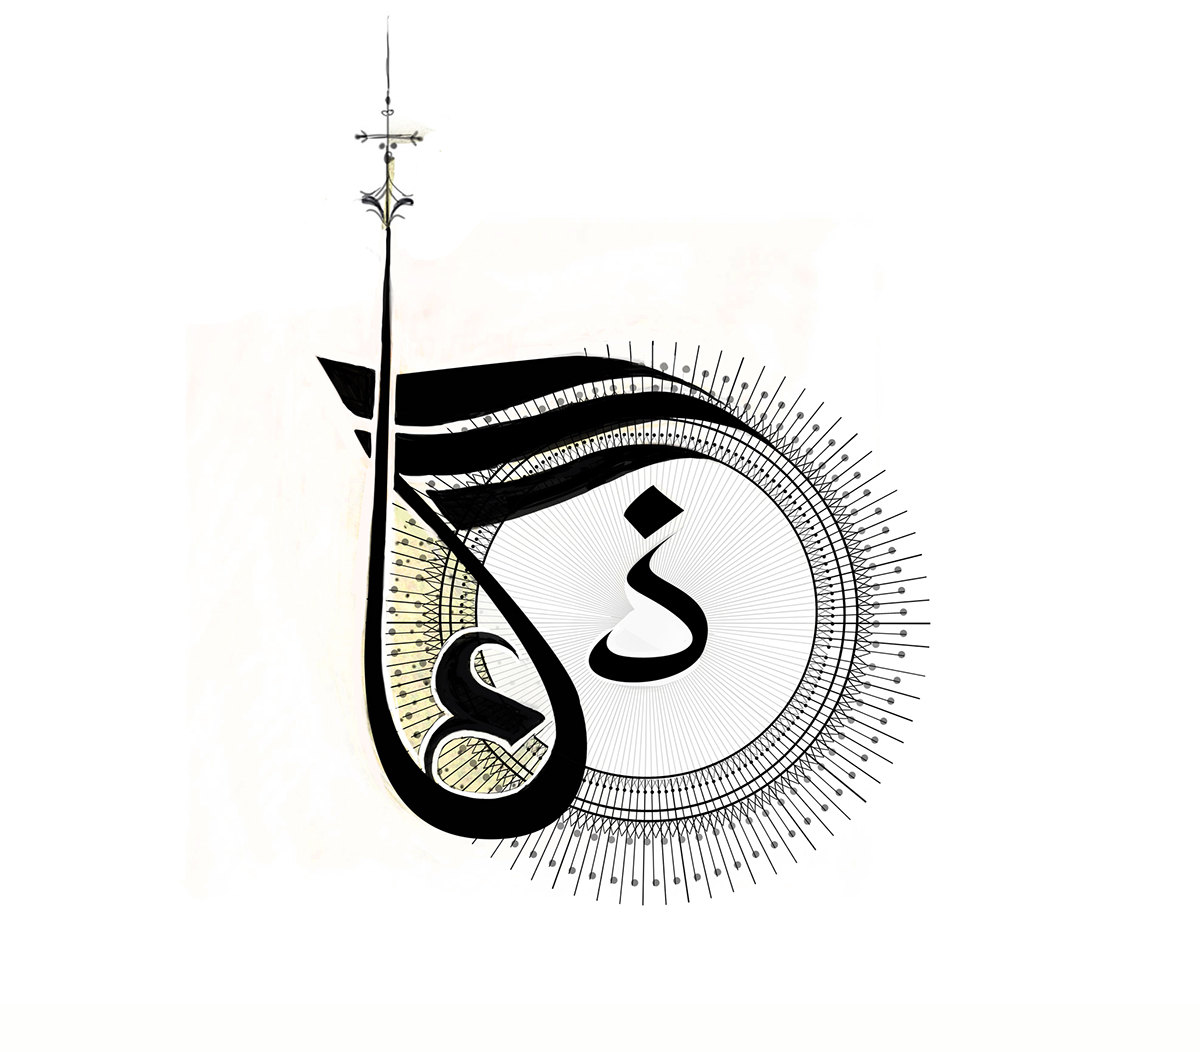 Calligraphy design on behance